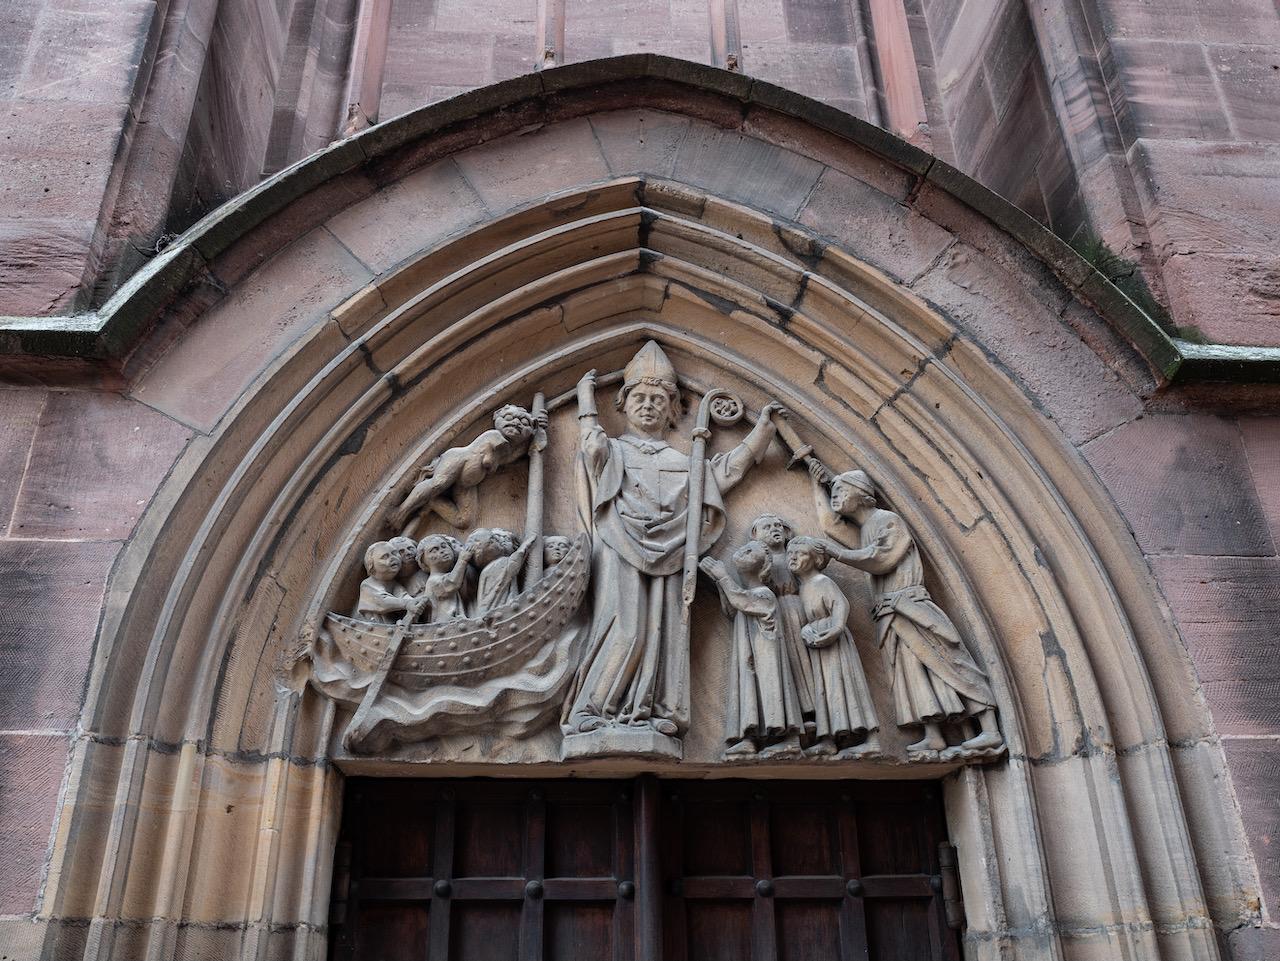 Nikolauskapelle, Tympanon über dem Portal